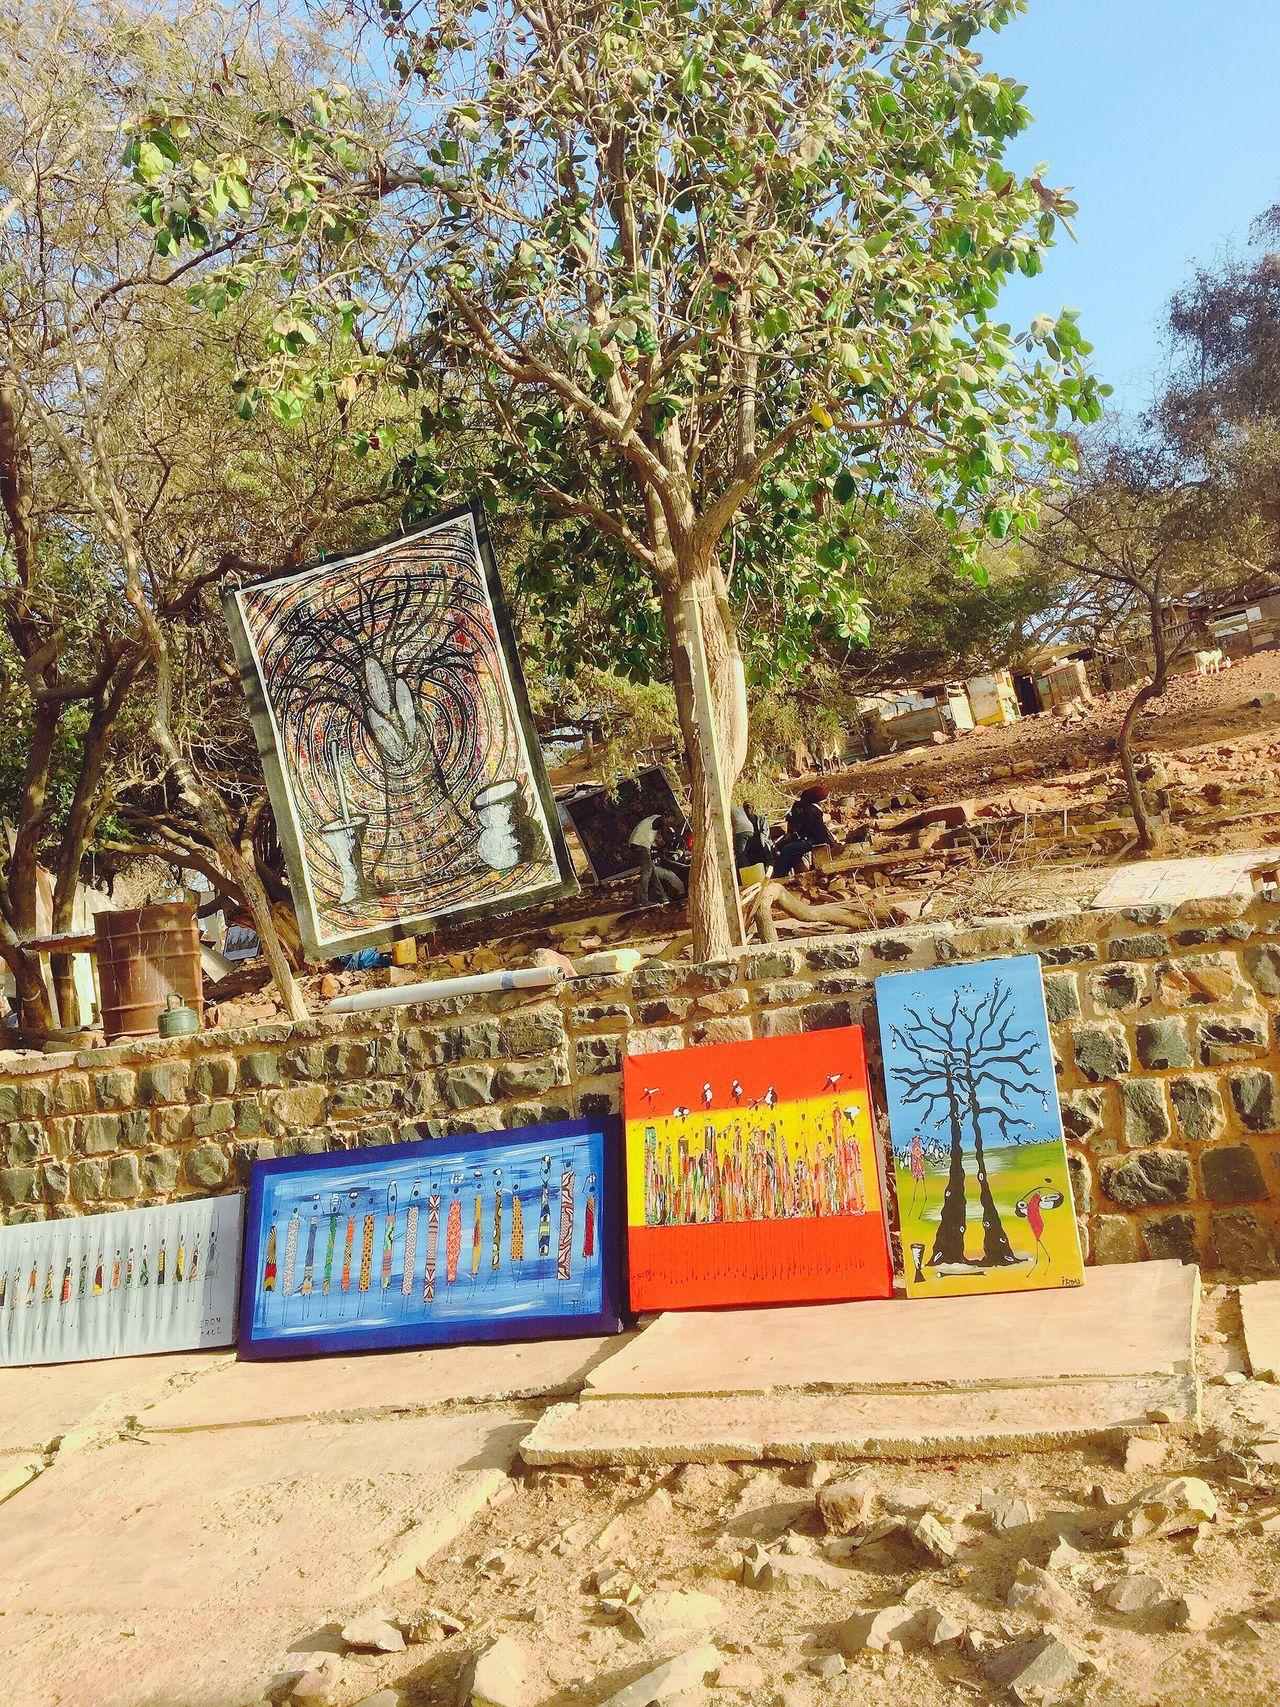 Art.2 Africa ArtWork Arts Culture And Entertainment Artistic Artistic Photo Artgallery Taking Photos Artphotography Art, Drawing, Creativity Goreeisland2016 Working Hard Theydontshowyou Senegal